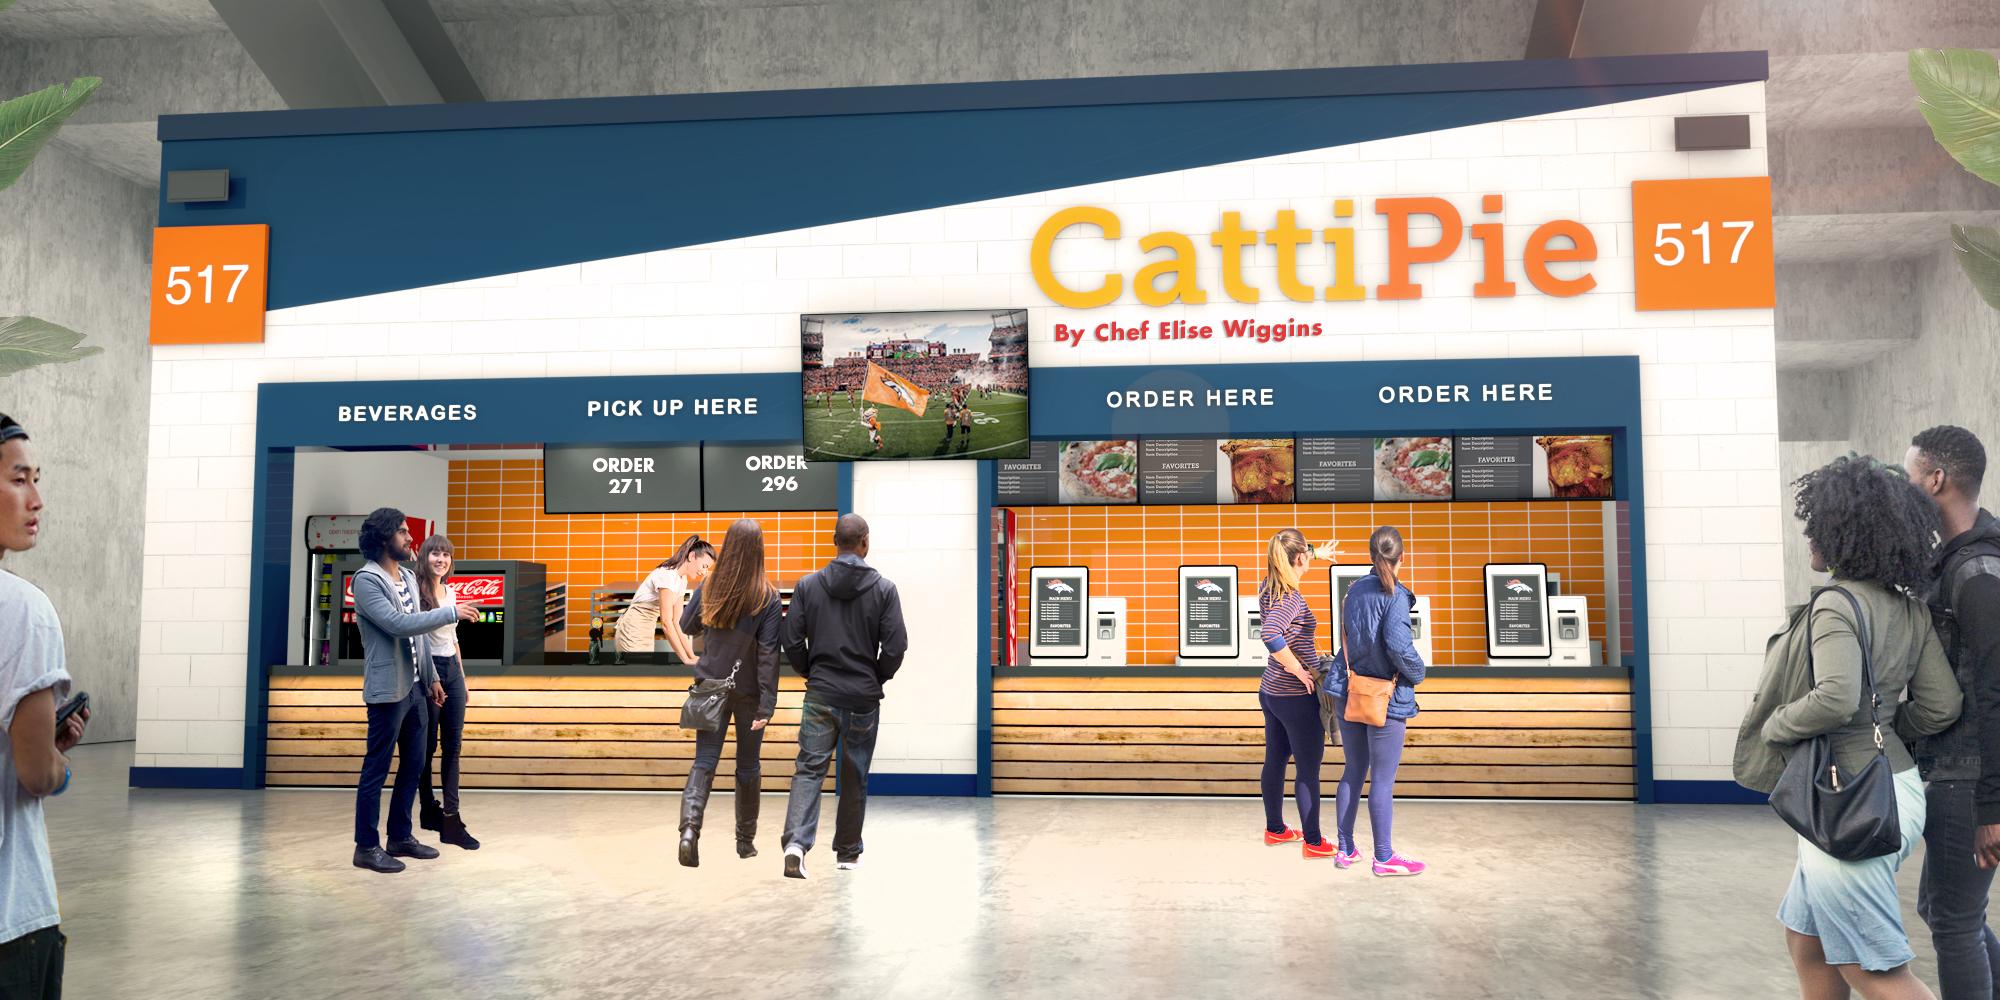 CP_Broncos_CattiPie CONCESSION 2018_09_21.jpg